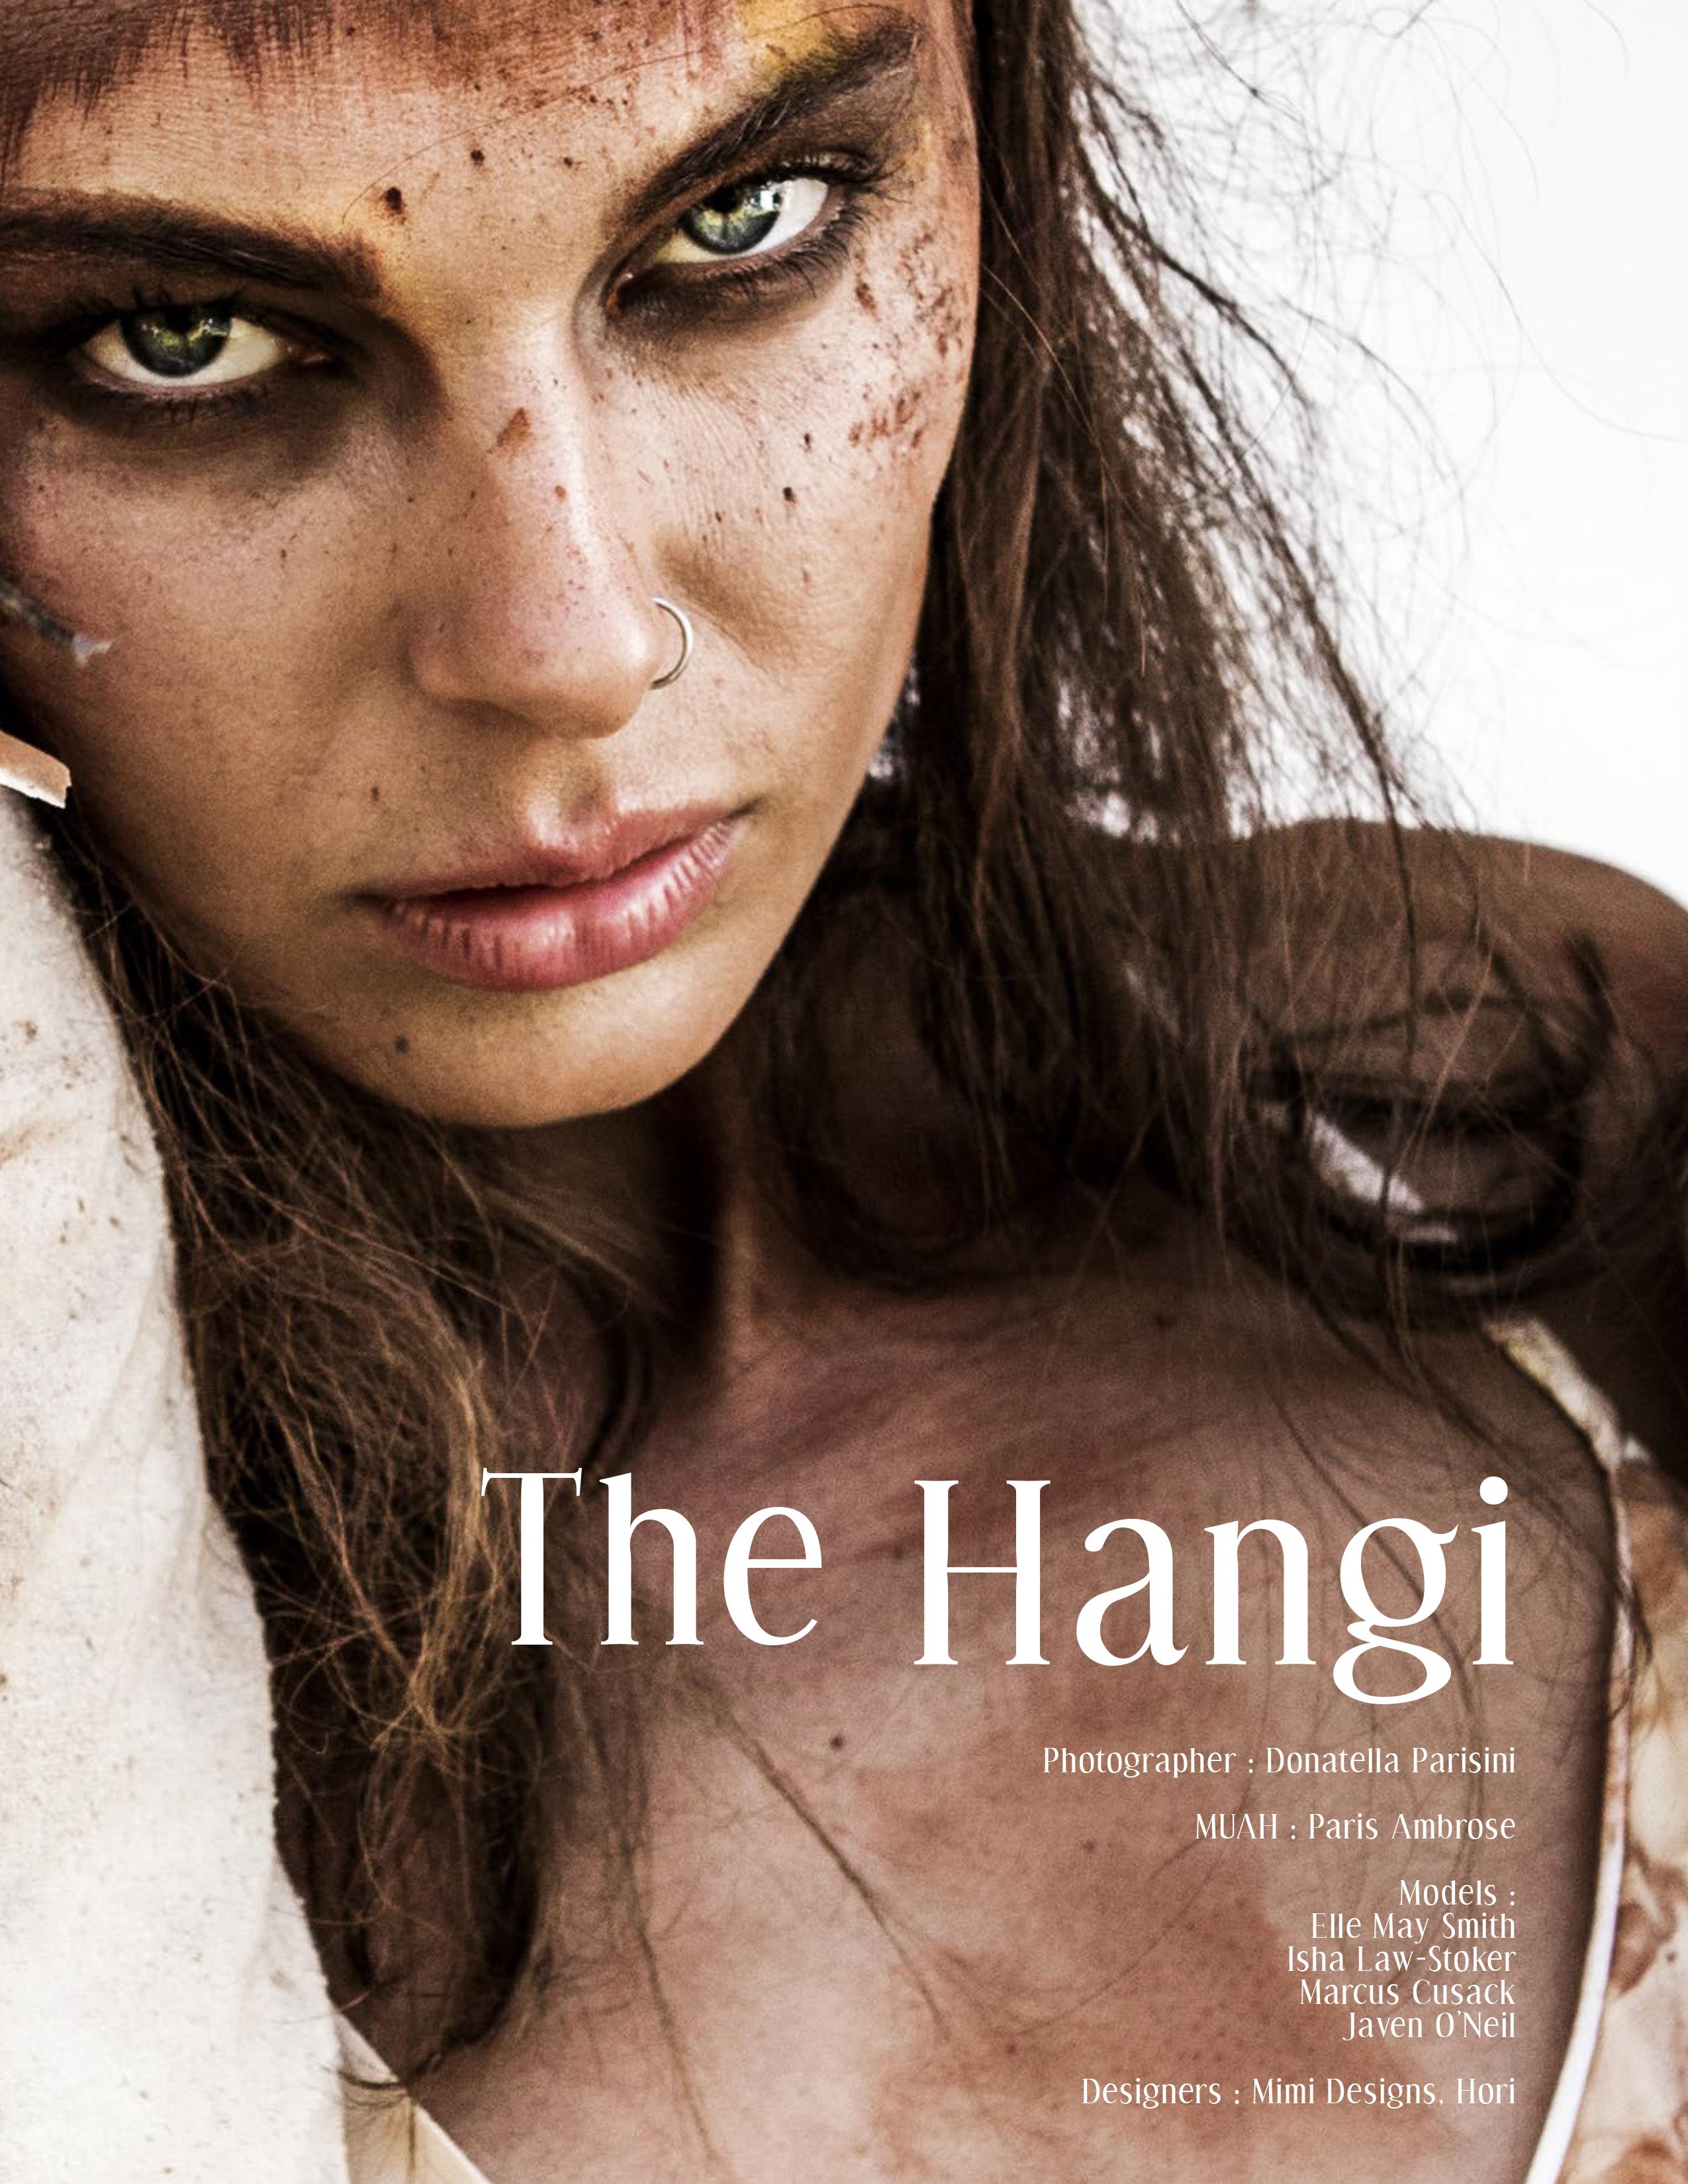 The Hangi ,Mimi Designs, Devour Magazine Stunning Model Portraits donatella parisini photography